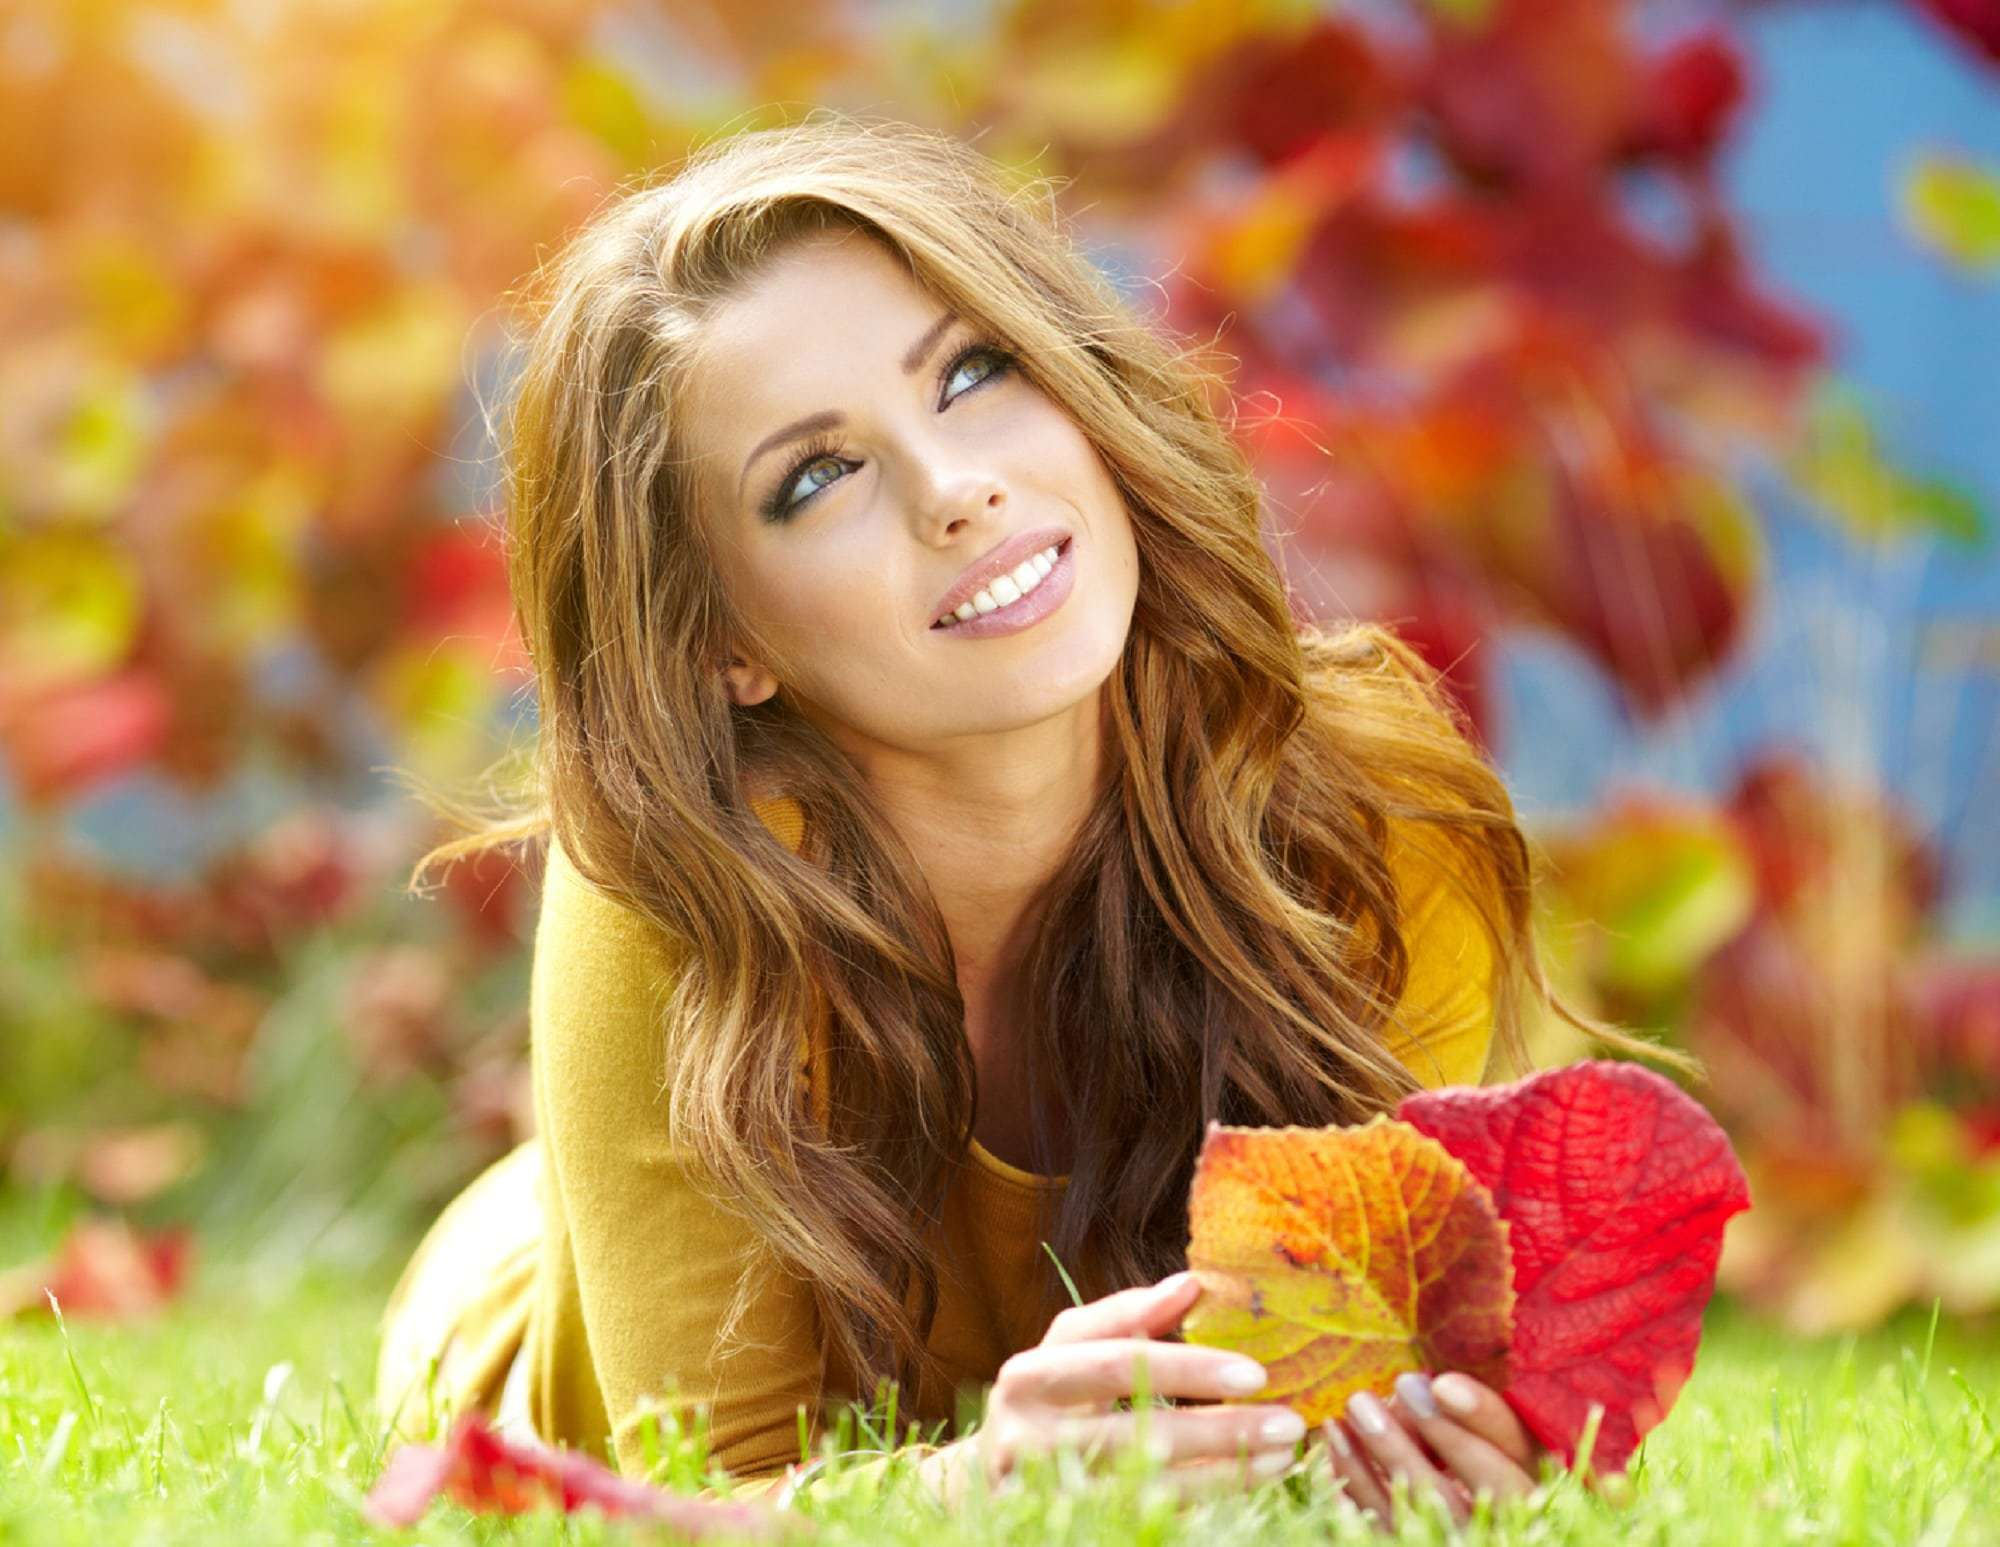 Fall Evening of Beauty